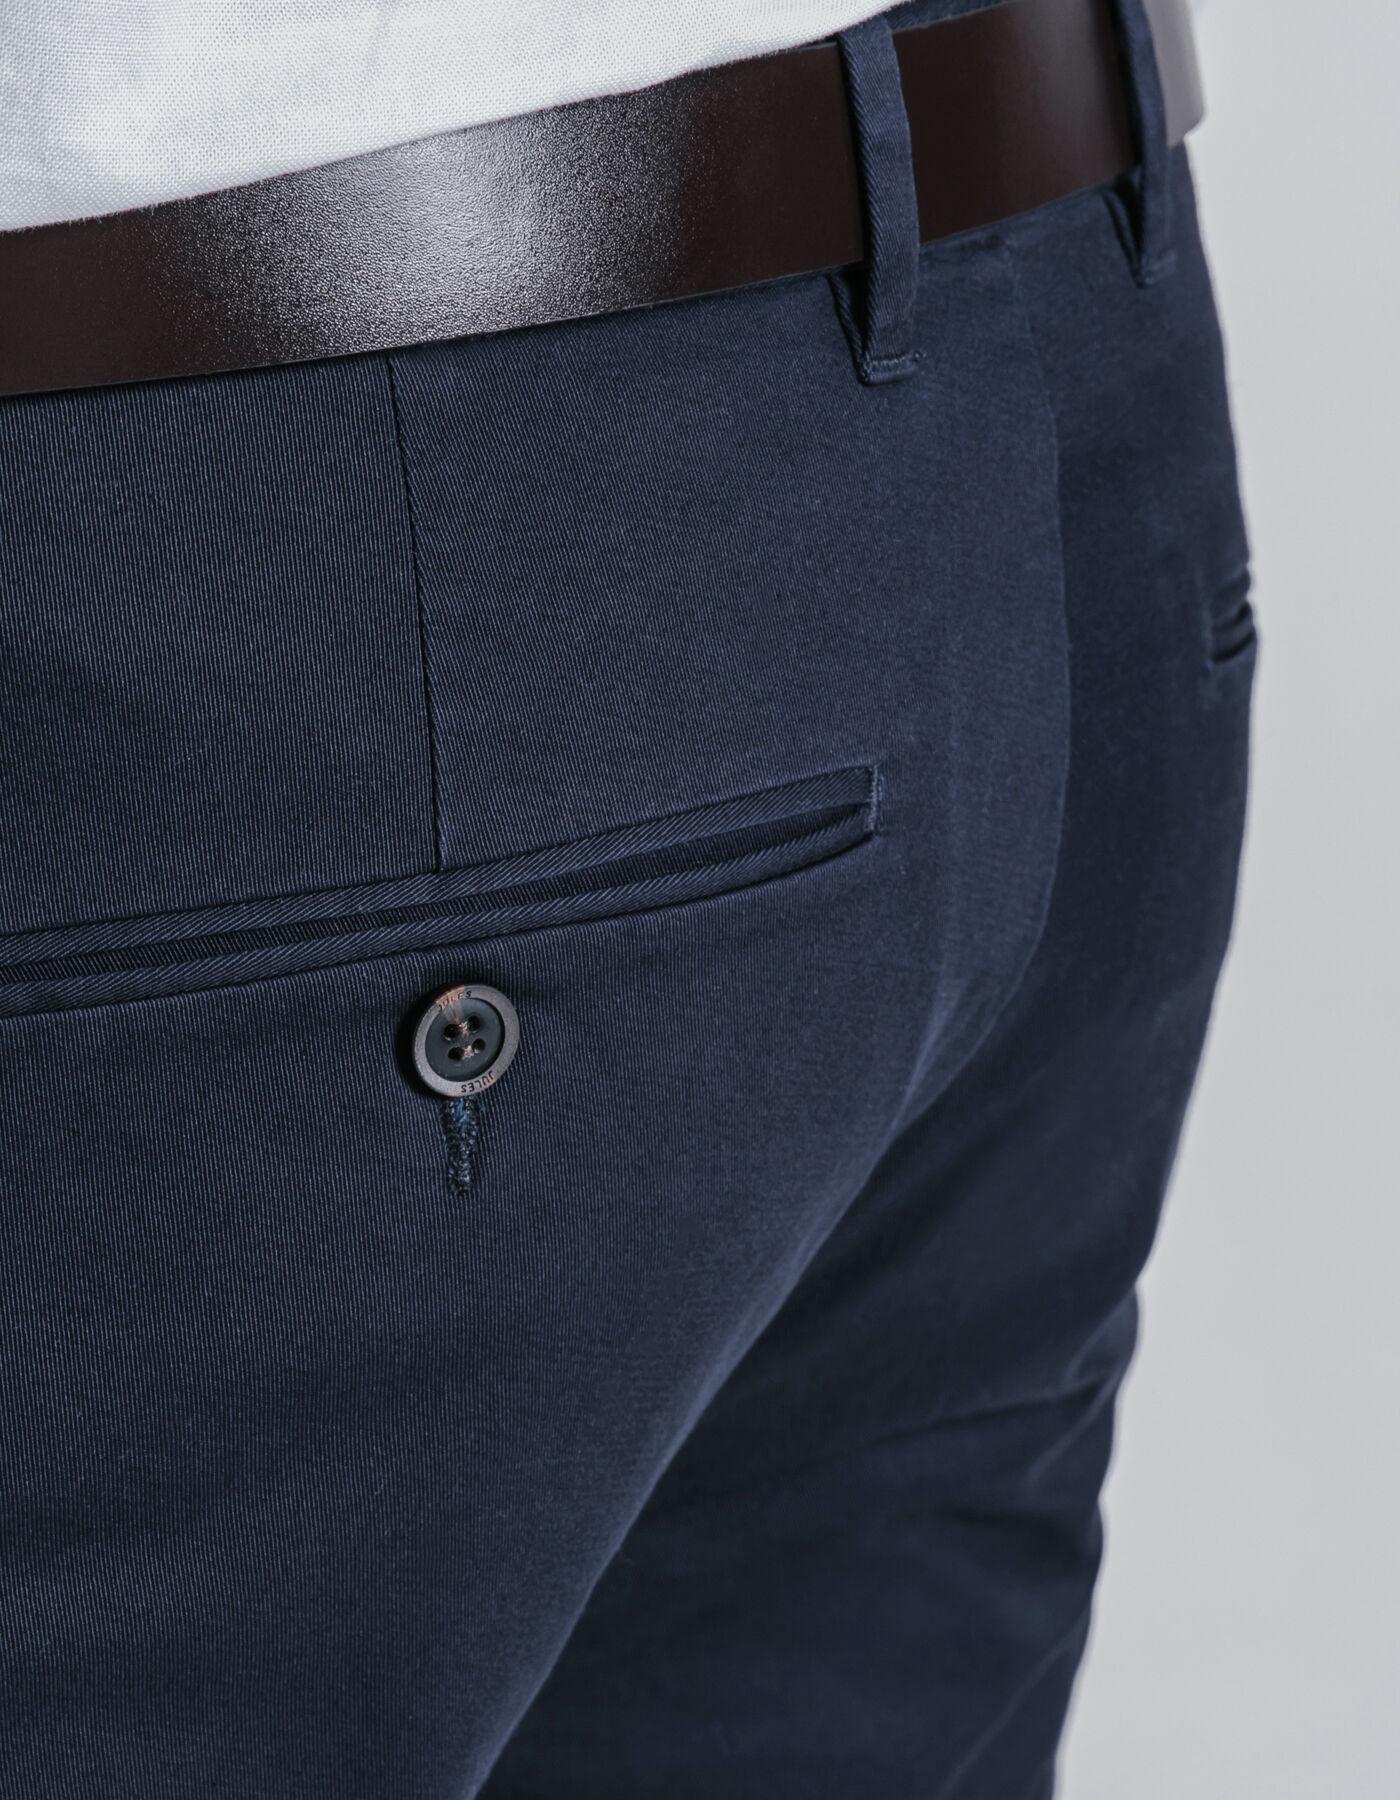 pantalon chino slim coton stretch bleu marine homme jules. Black Bedroom Furniture Sets. Home Design Ideas